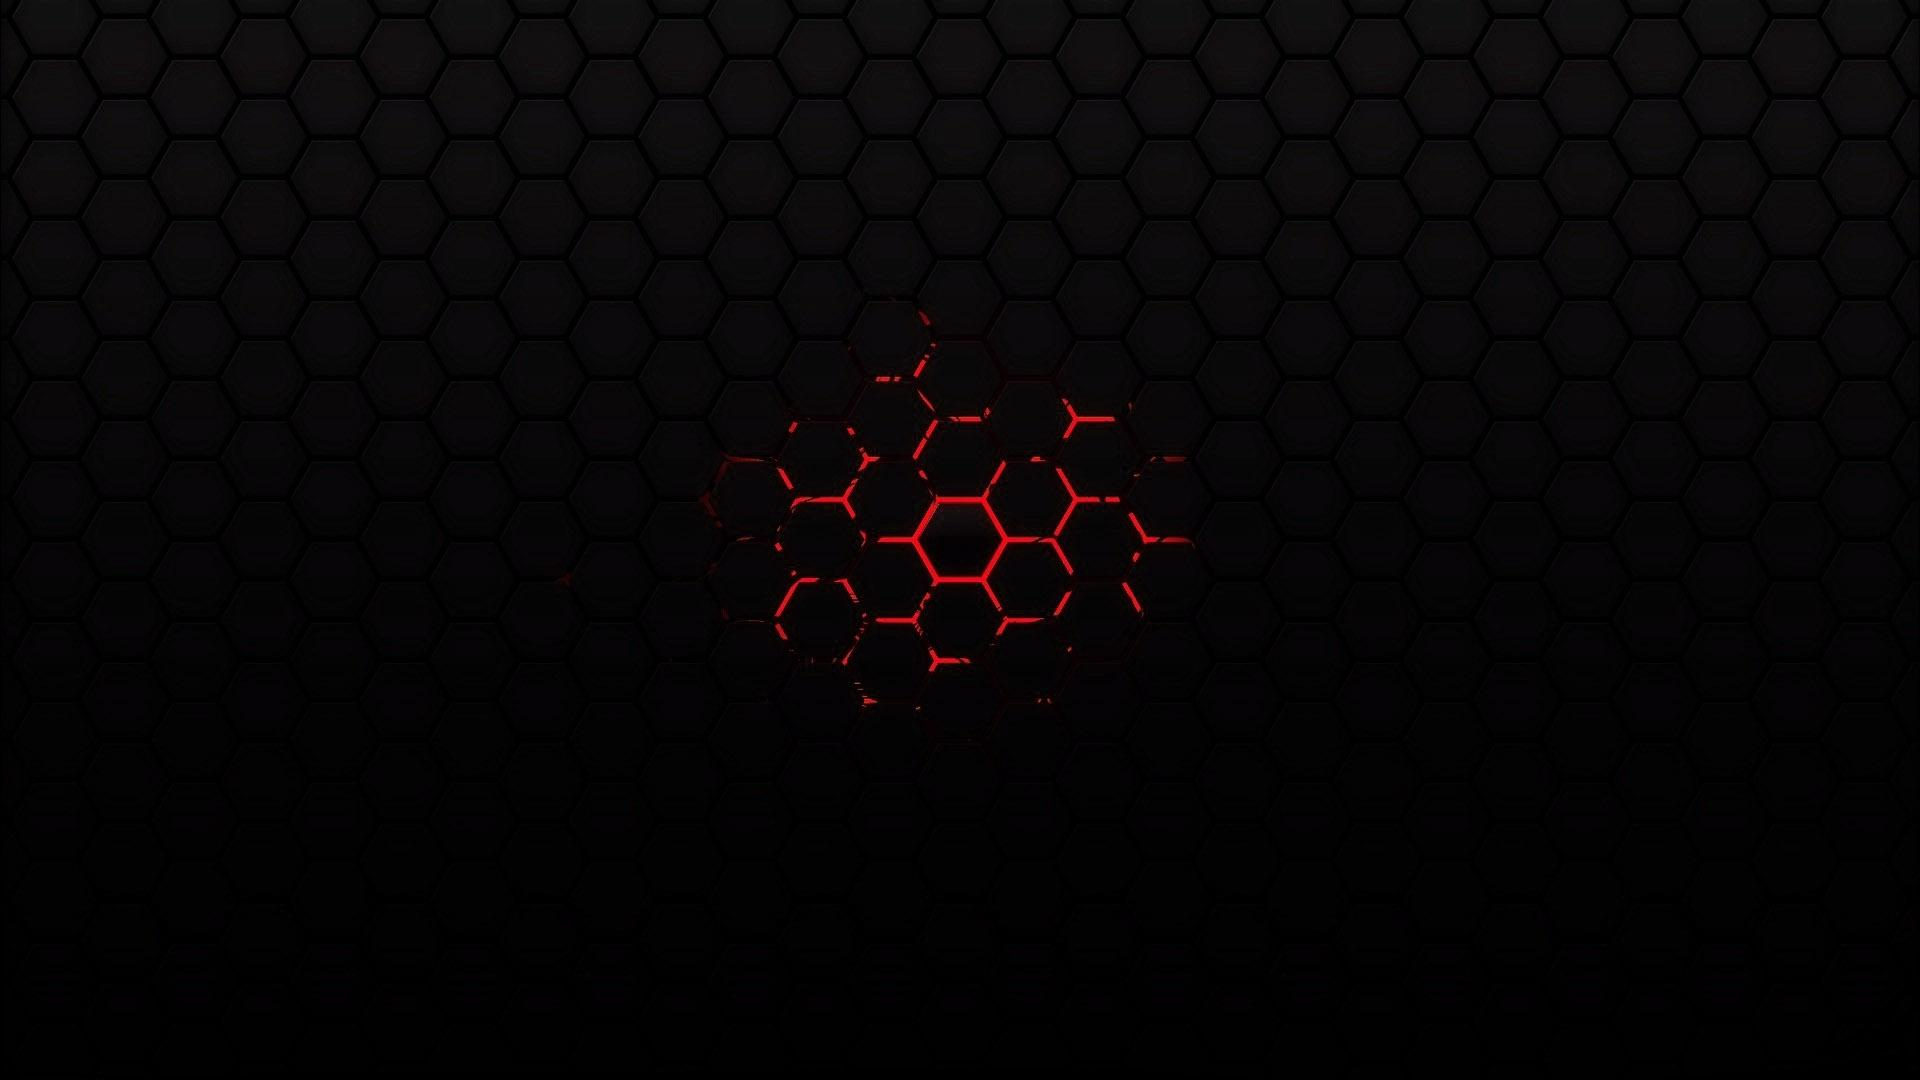 download black red wallpaper 1920x1080 | wallpoper #362733